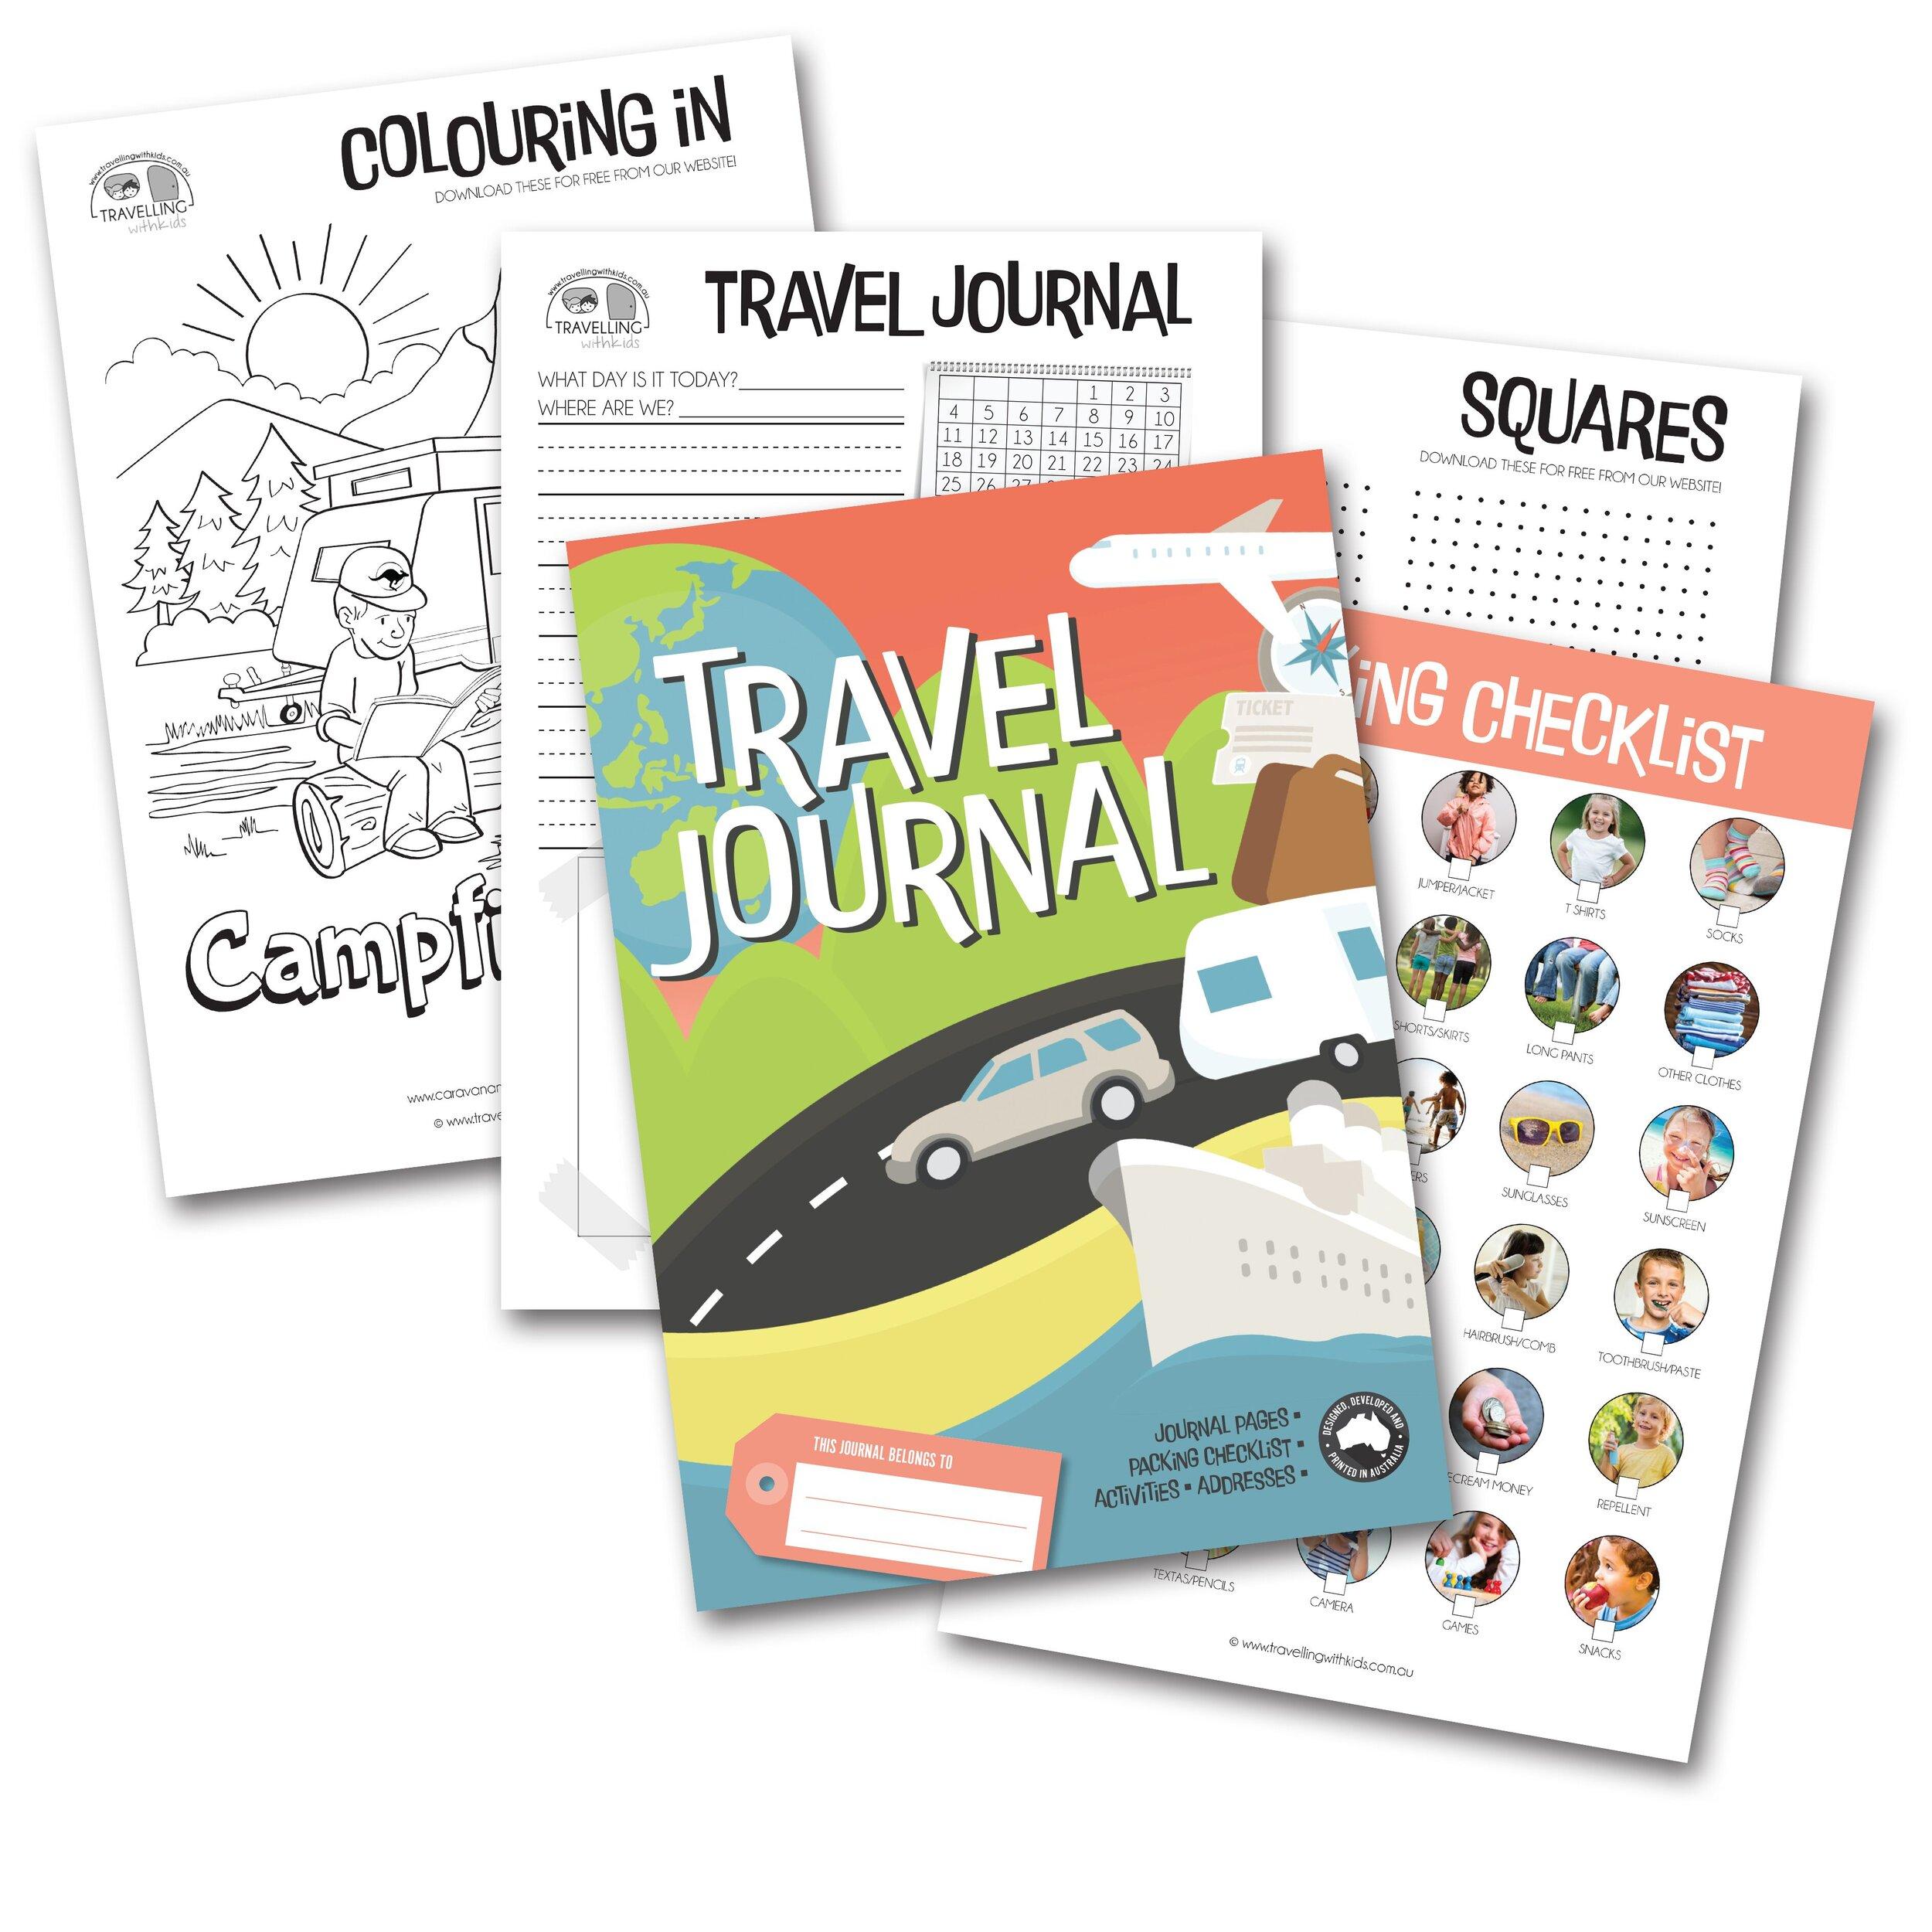 Travel Journal $24.95